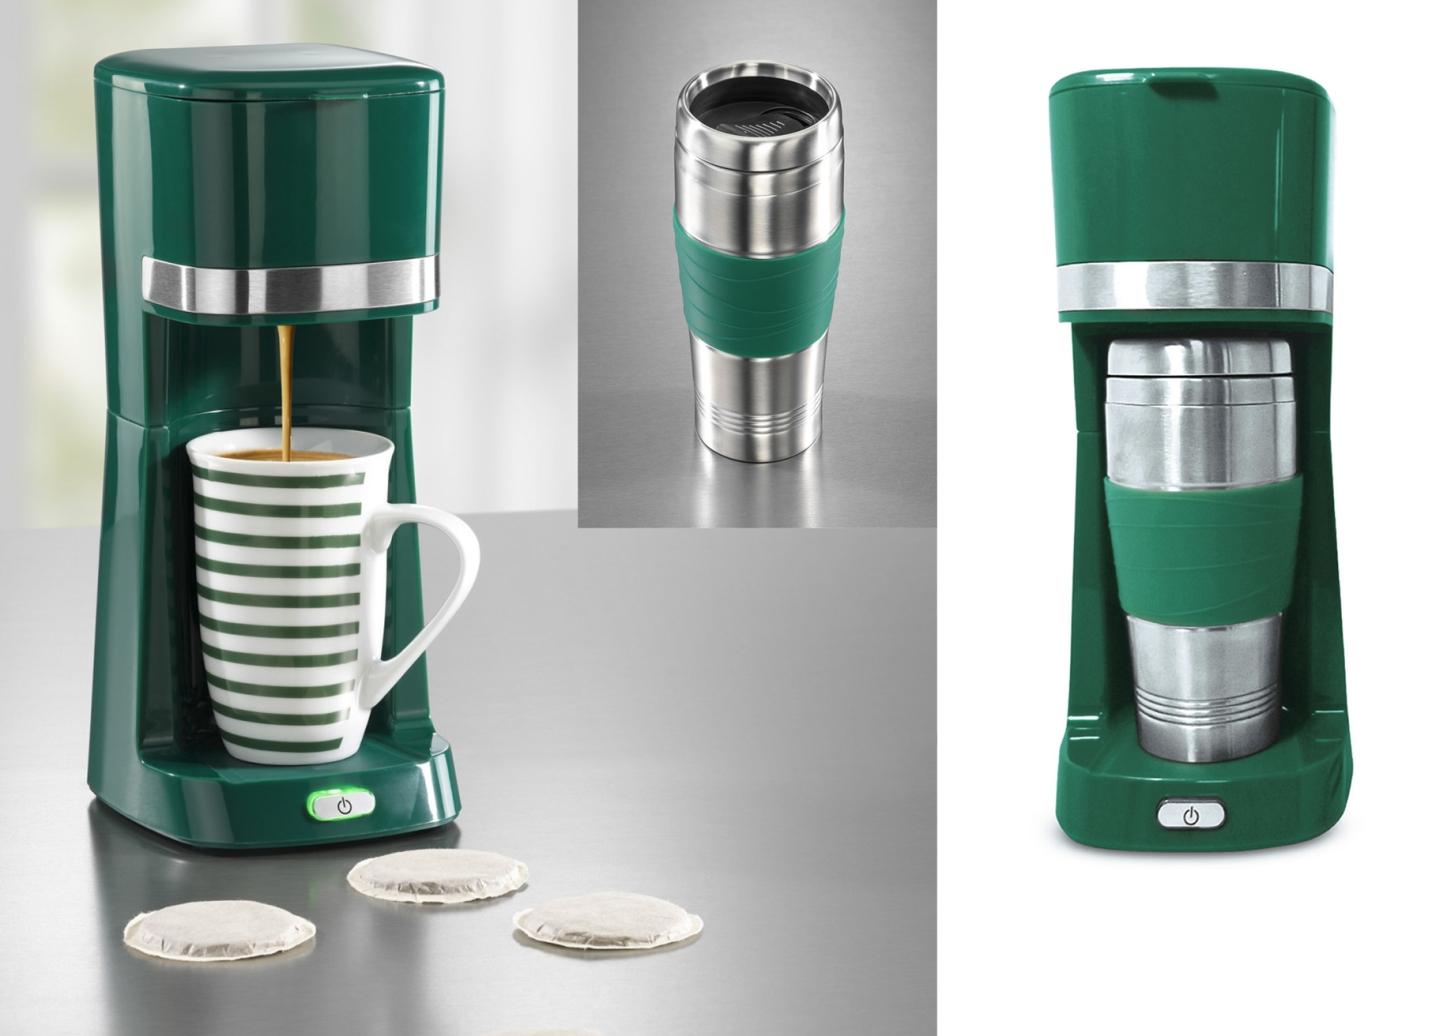 coffeemaxx single kaffeemaschine mit keramik und. Black Bedroom Furniture Sets. Home Design Ideas